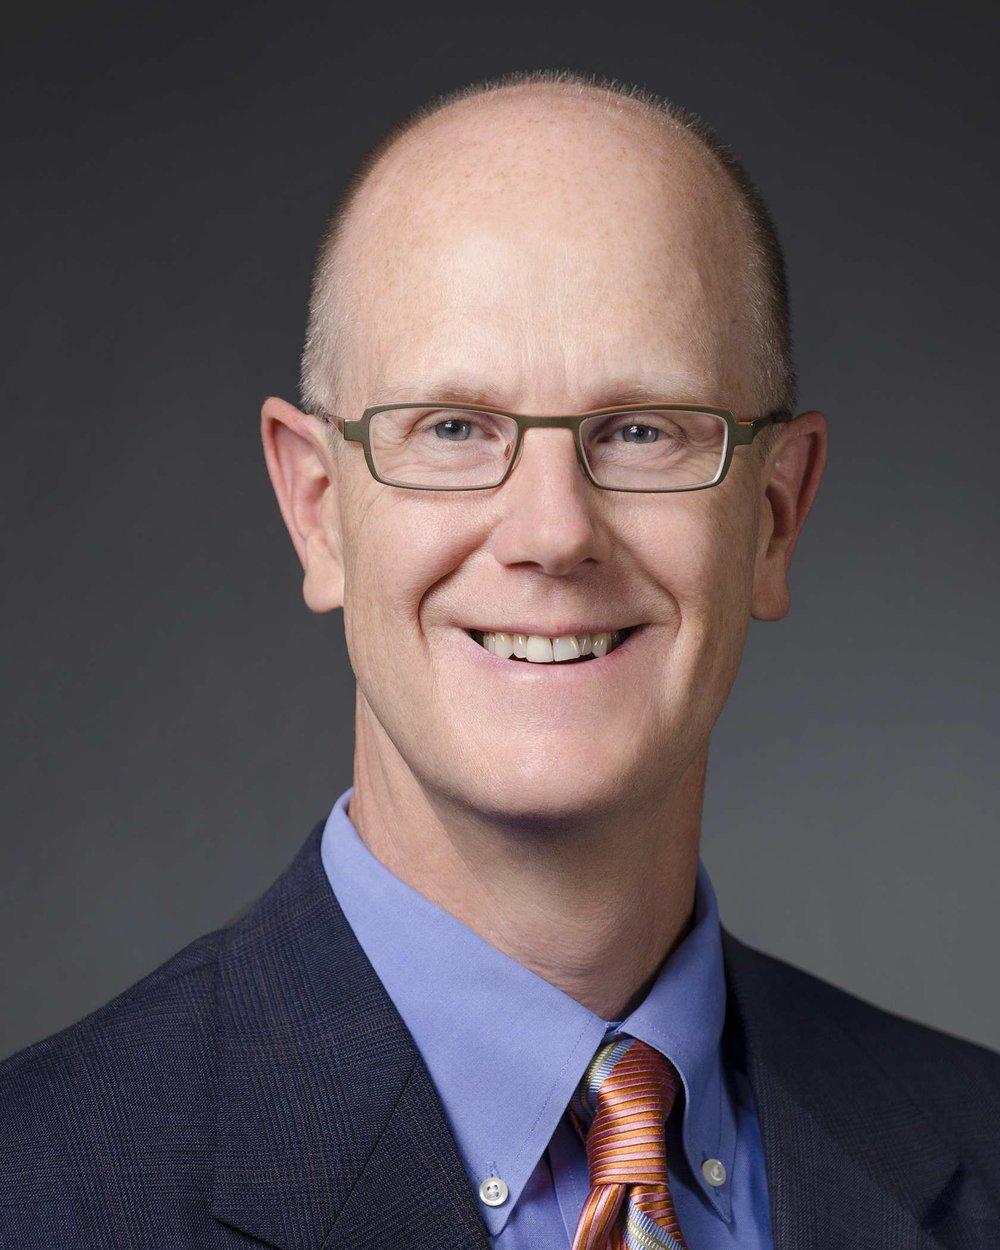 Rev. Dr. Jeffrey Sartain